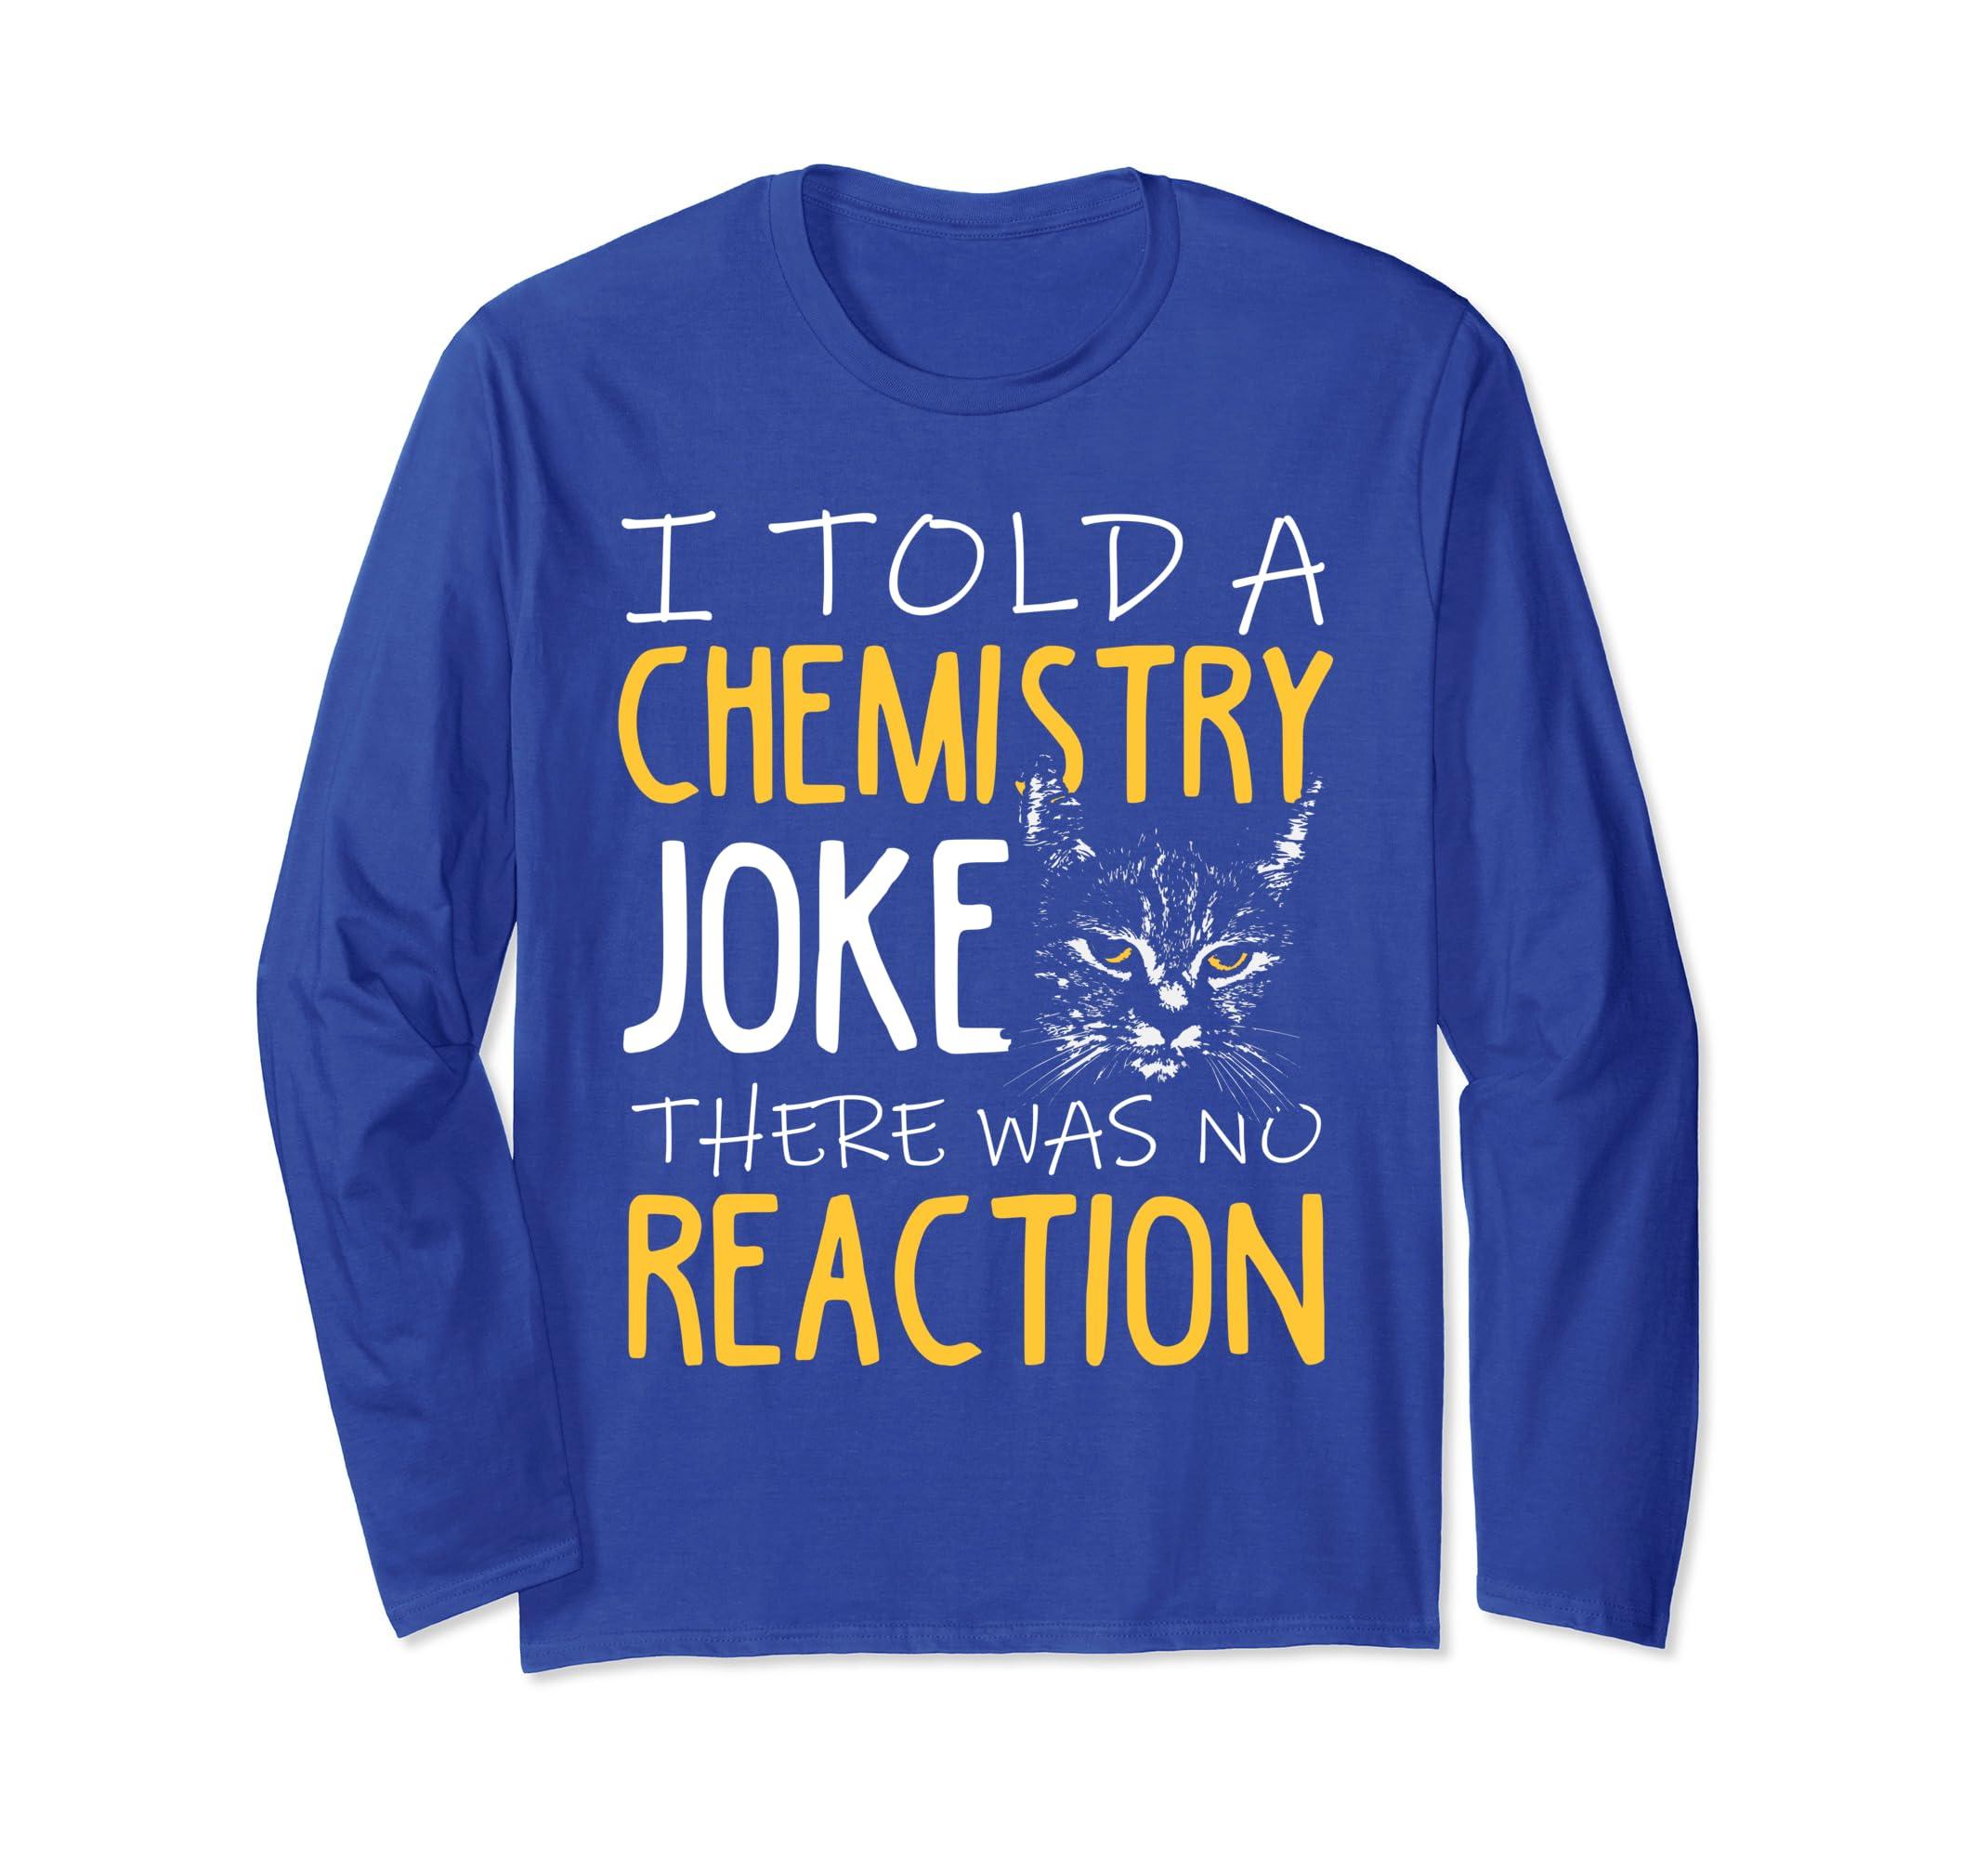 b8a2e07e7 Amazon.com: Told A Chemistry Joke, No Reaction Science Long Sleeve Shirt:  Clothing